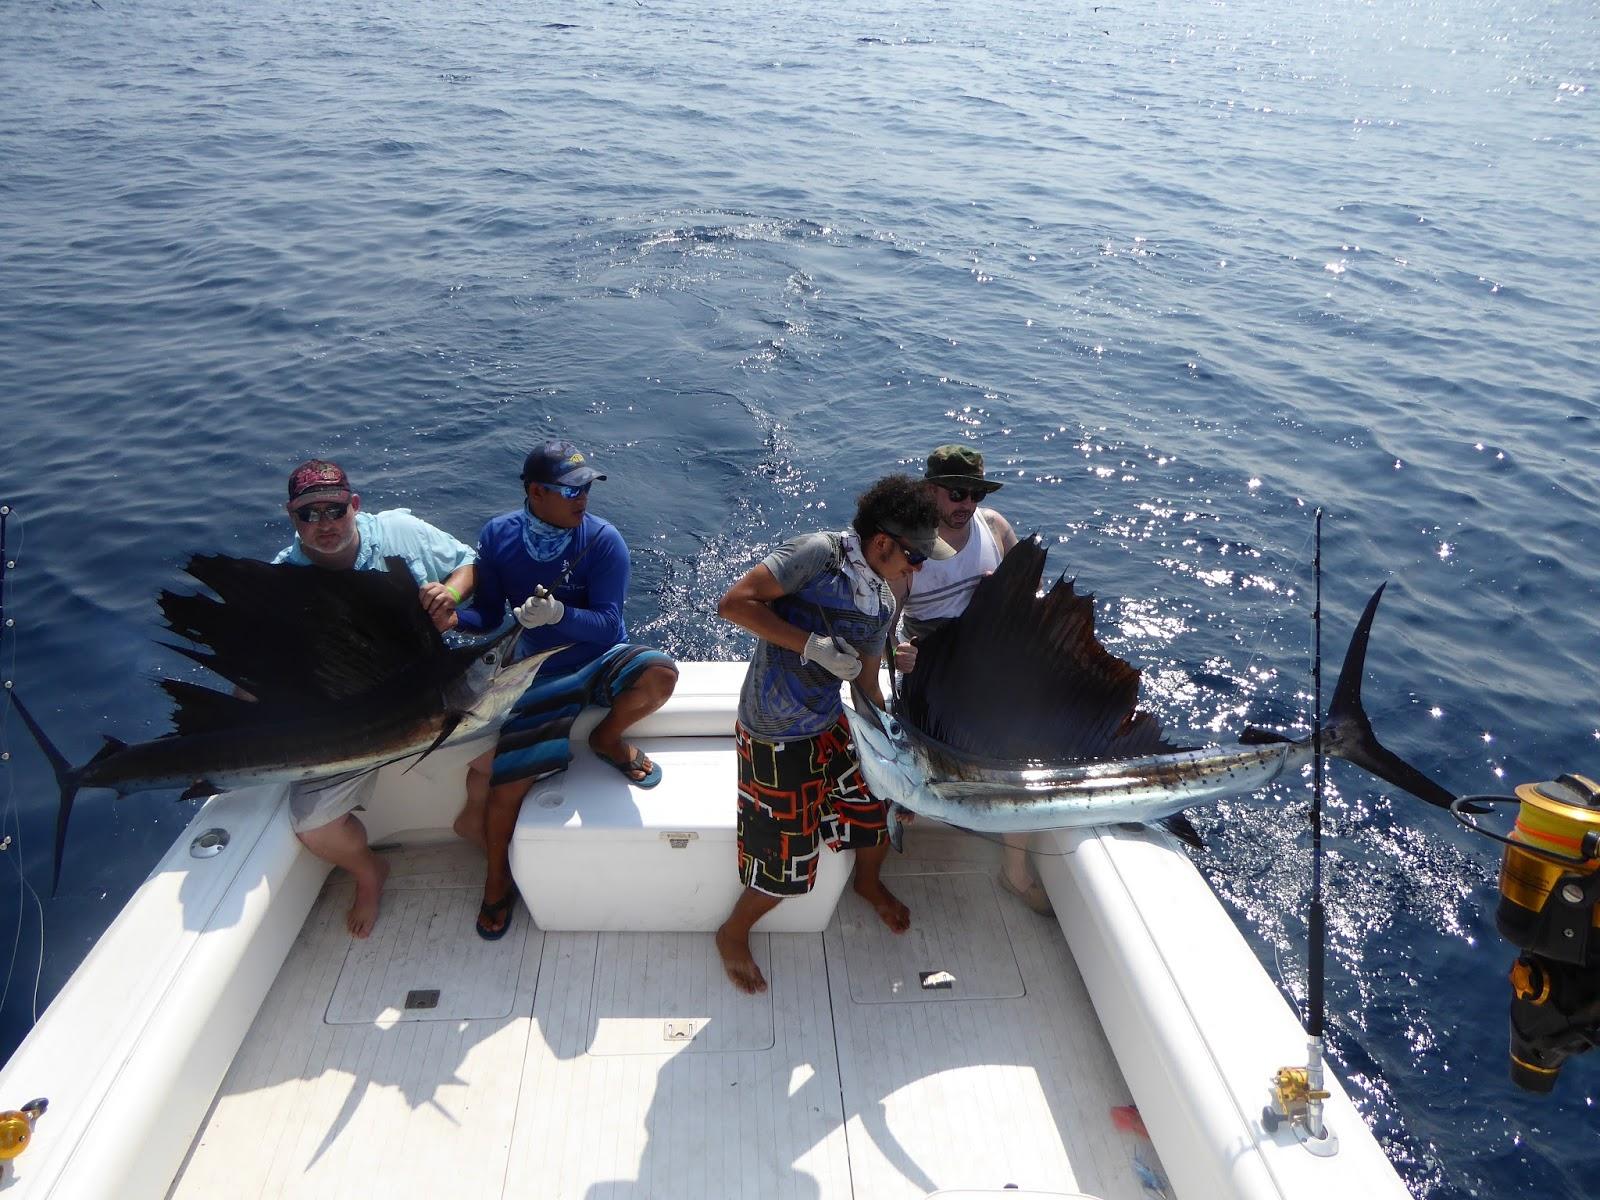 Mad marlin lodge sailfish marlin fishing charters guatemala for Marlin fishing charters